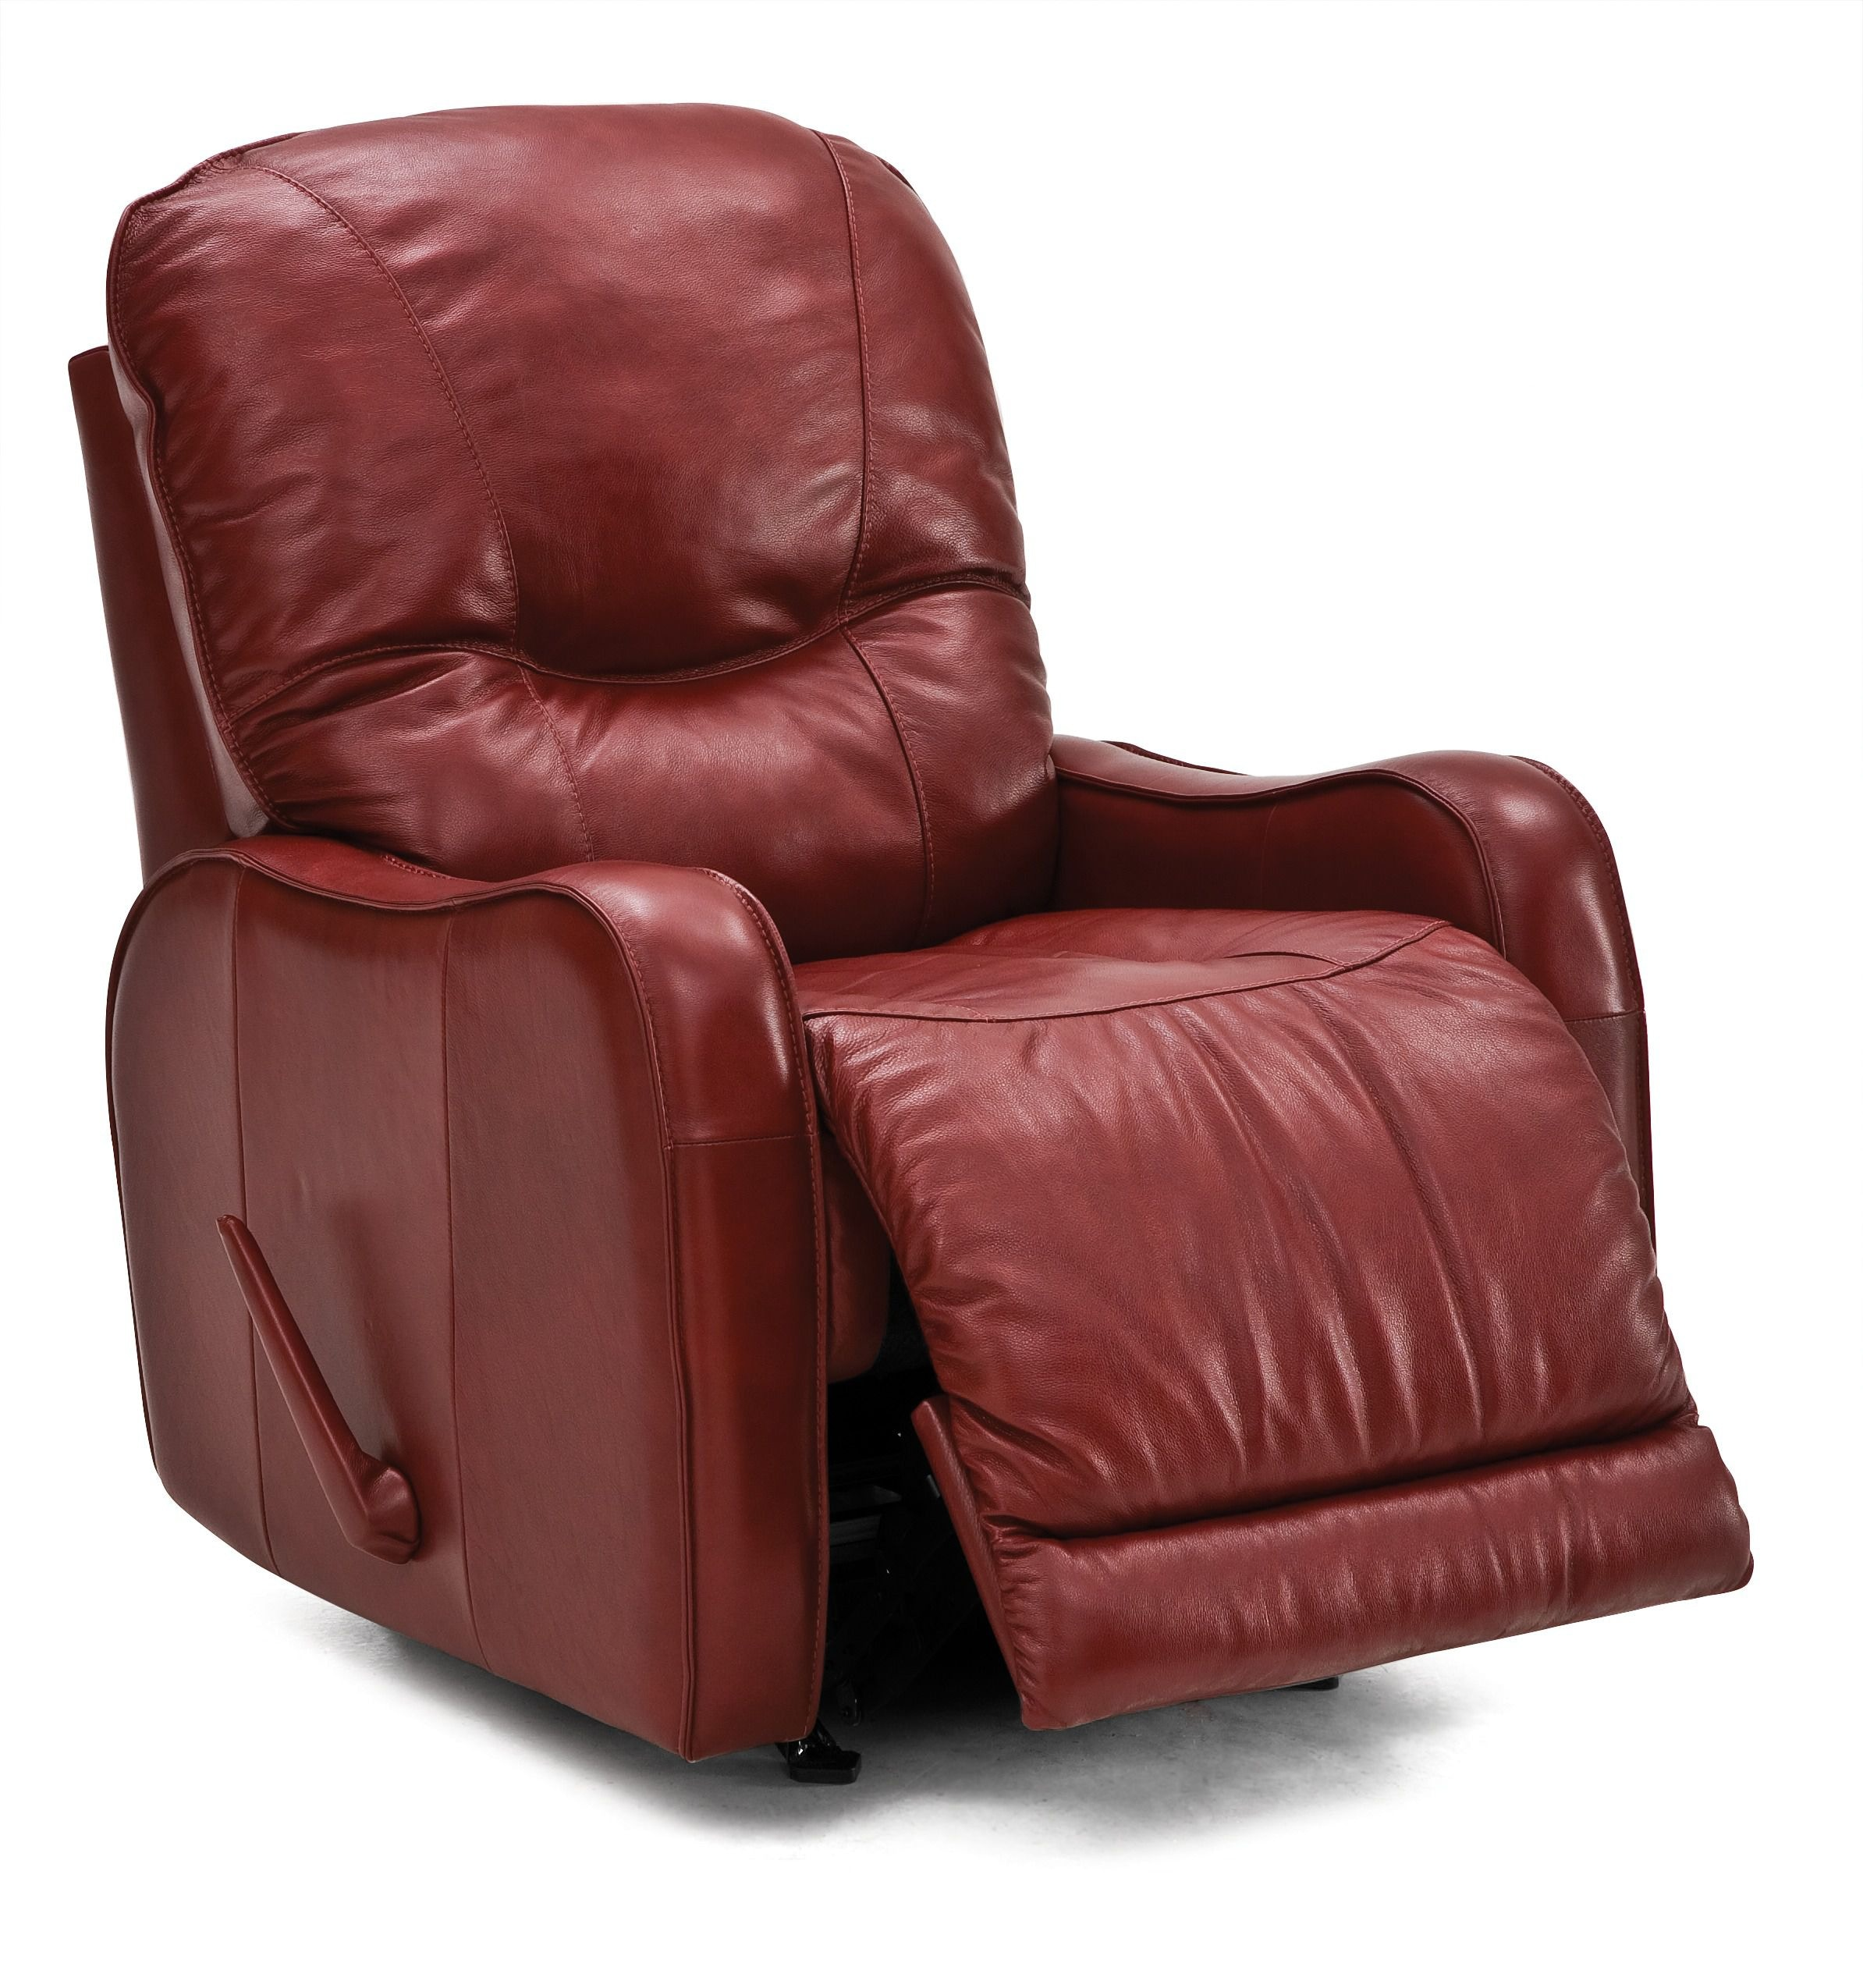 rocker and recliner chair covers kmart palliser furniture living room 43012 32